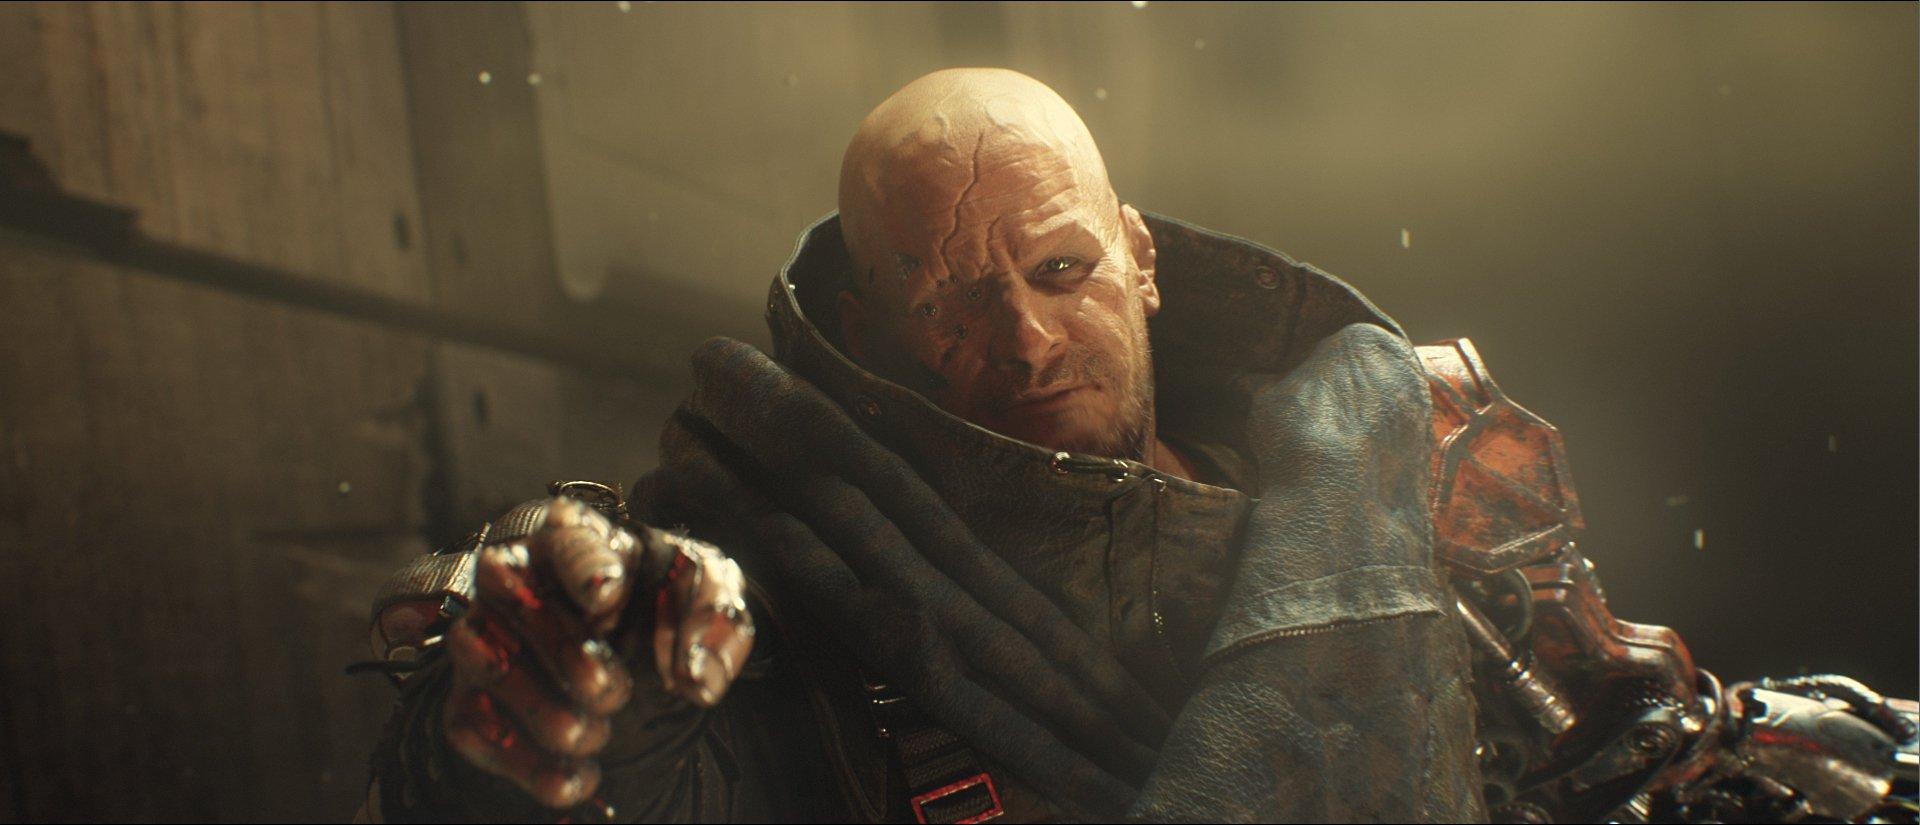 Deus Ex: Mankind Divided Trailer Reveals The Sequel's Story #32700